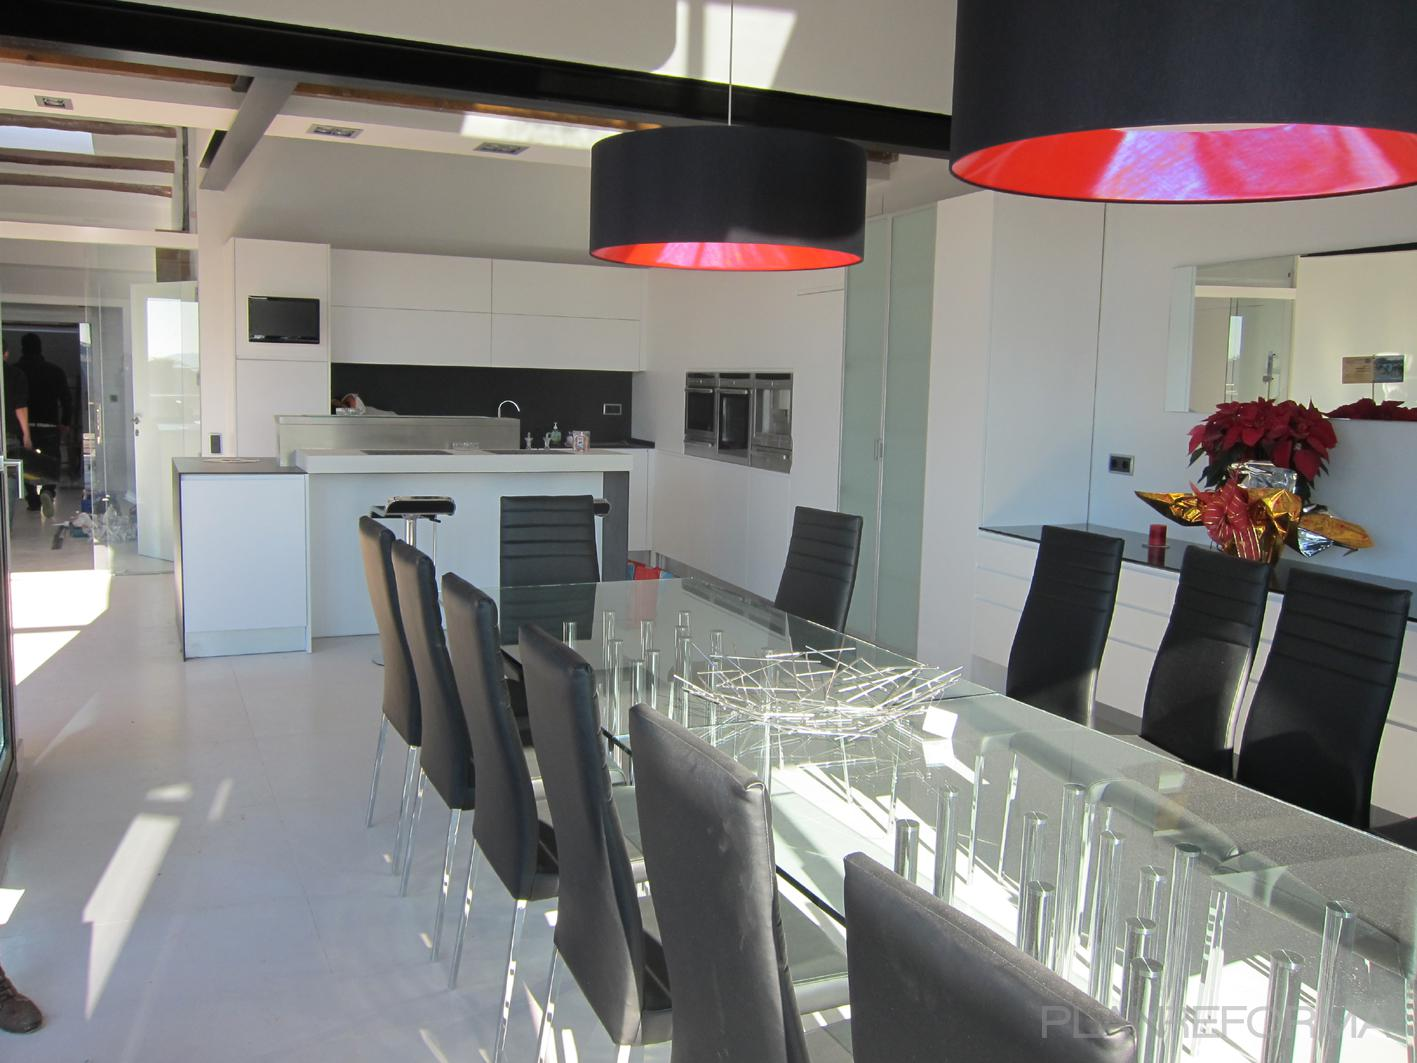 Comedor cocina style moderno color gris negro for Comedor gris moderno